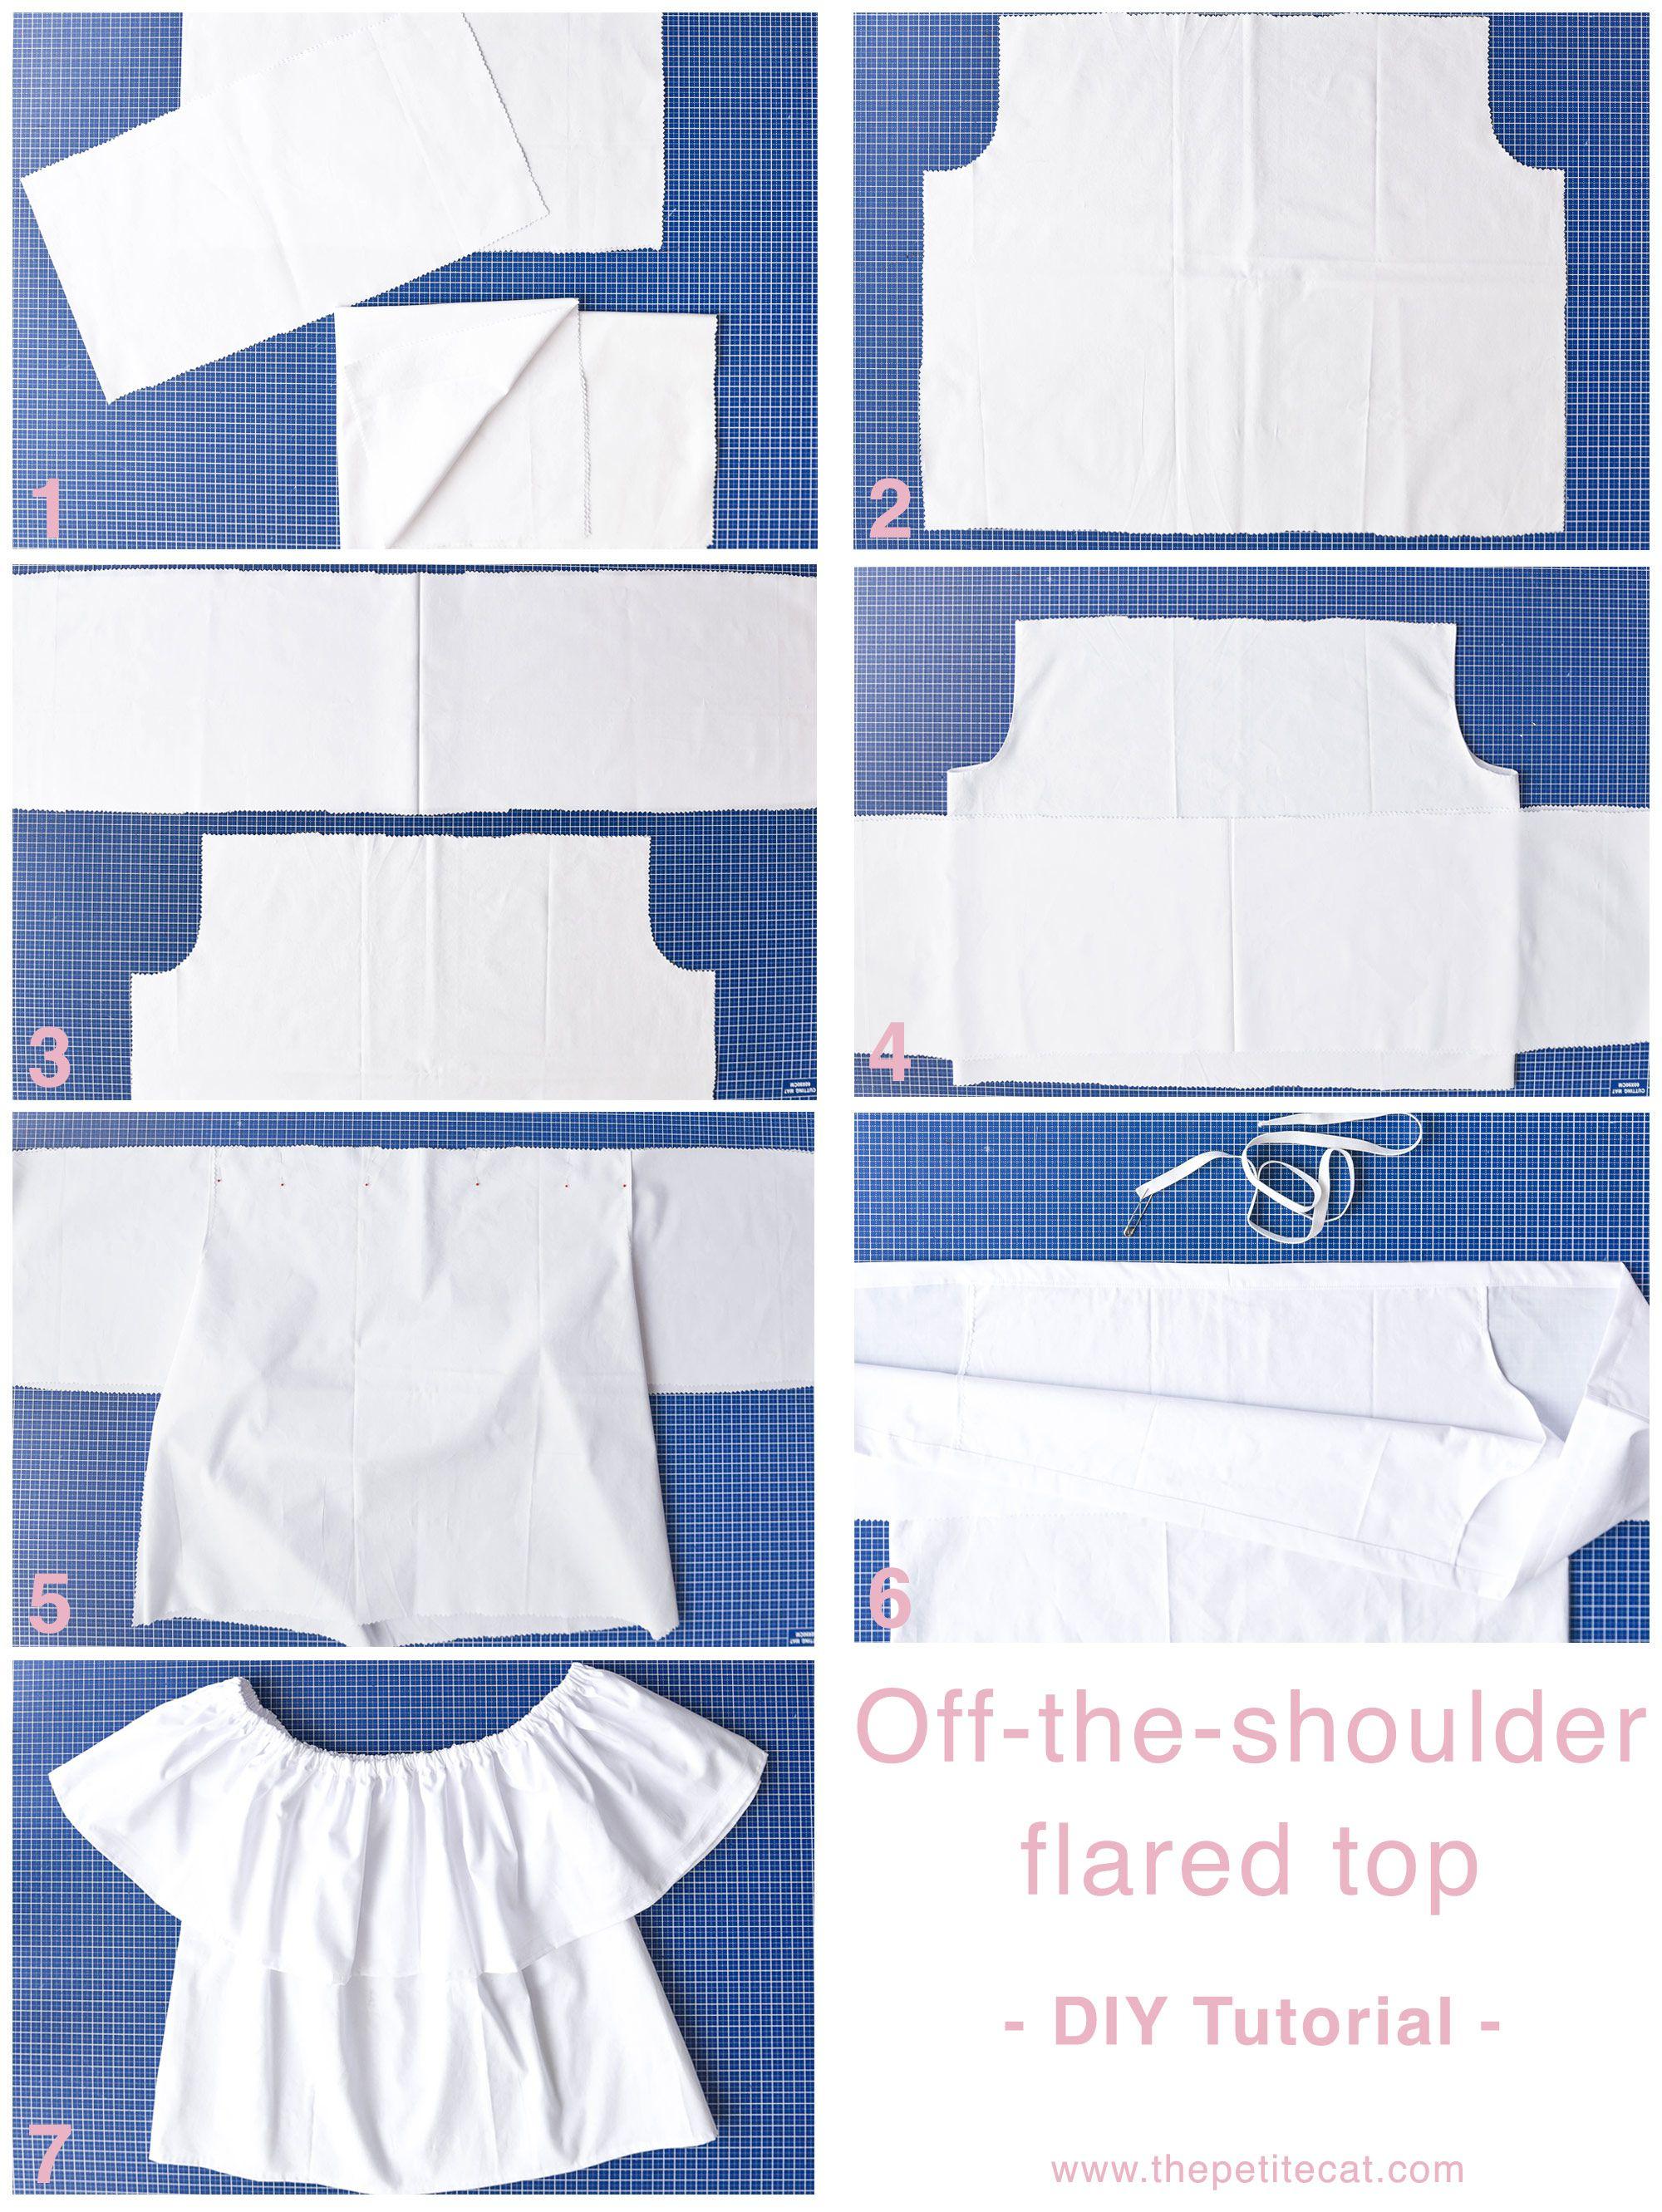 Diy Tutorial Off The Shoulder Top And Dress Thepetitecat Project2 Dress Patterns Diy Diy Dress Diy Fashion Clothing